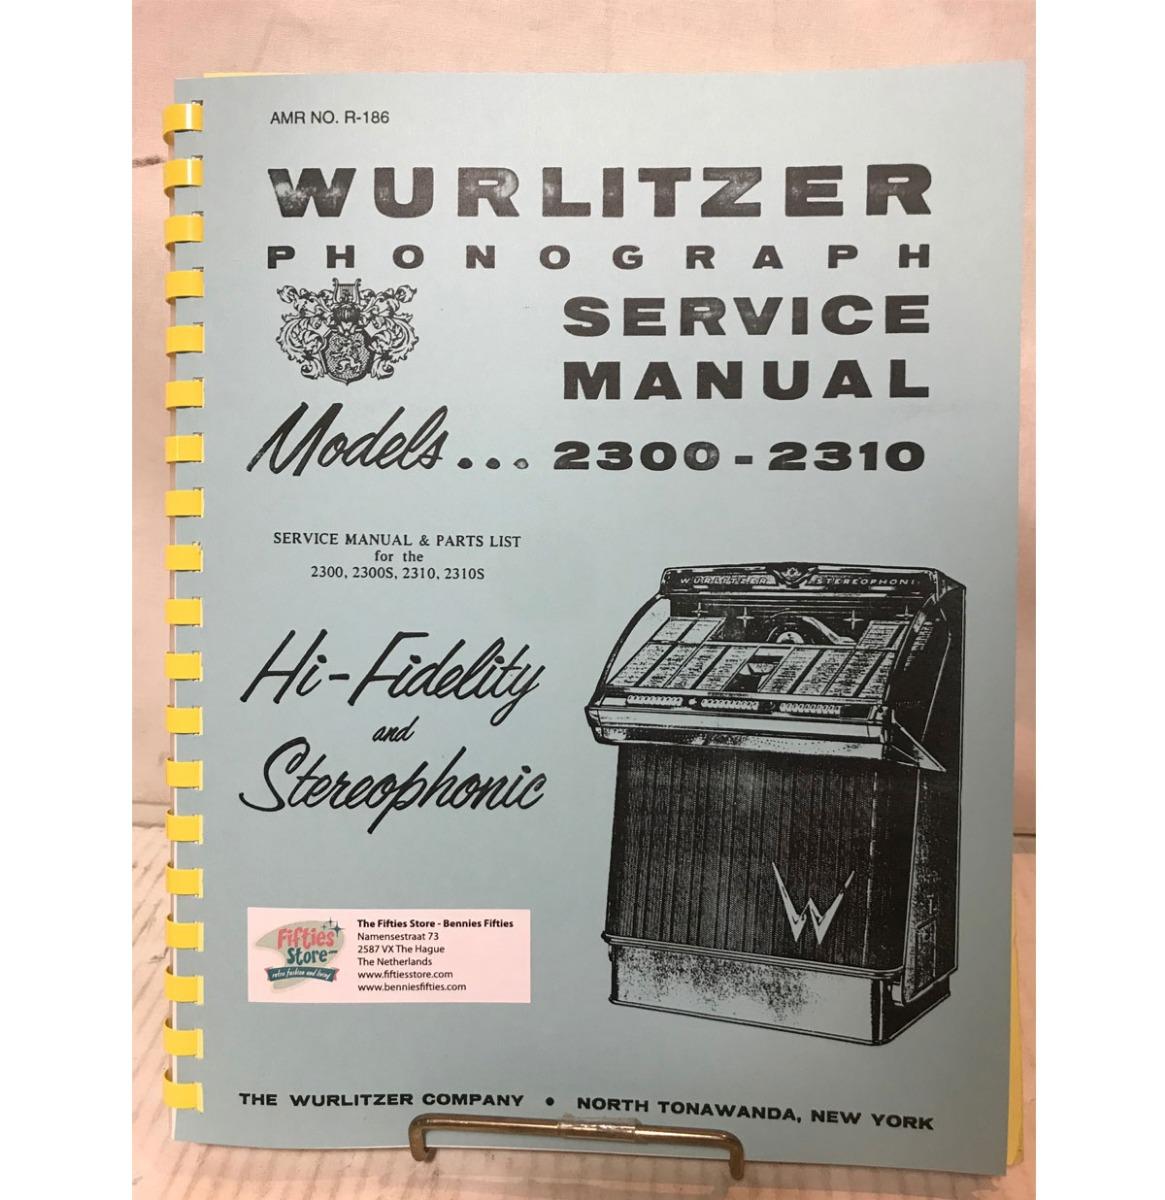 Wurlitzer 1900 Jukebox Service Manual